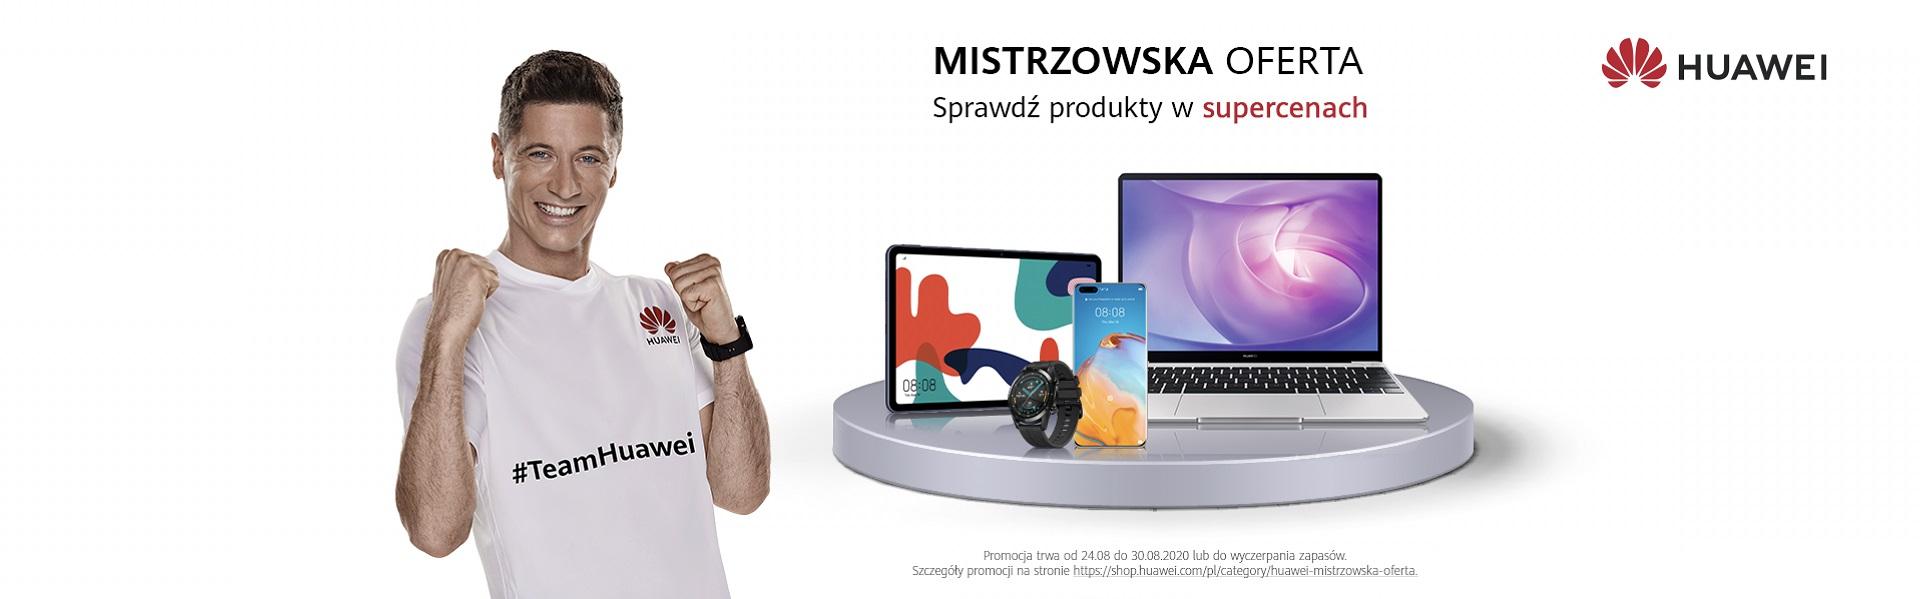 Huawei promocja mistrzowska oferta Robert Lewandowski